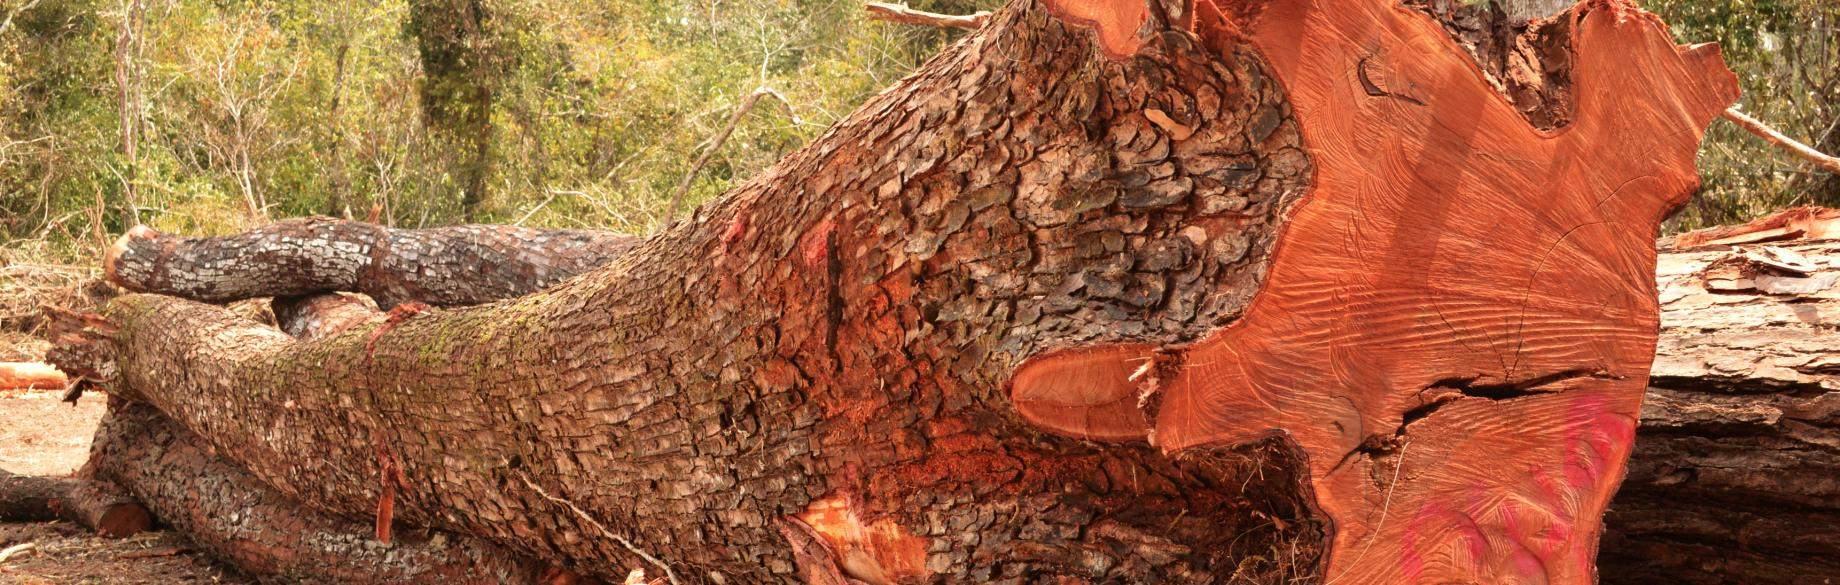 Красное дерево махагони.